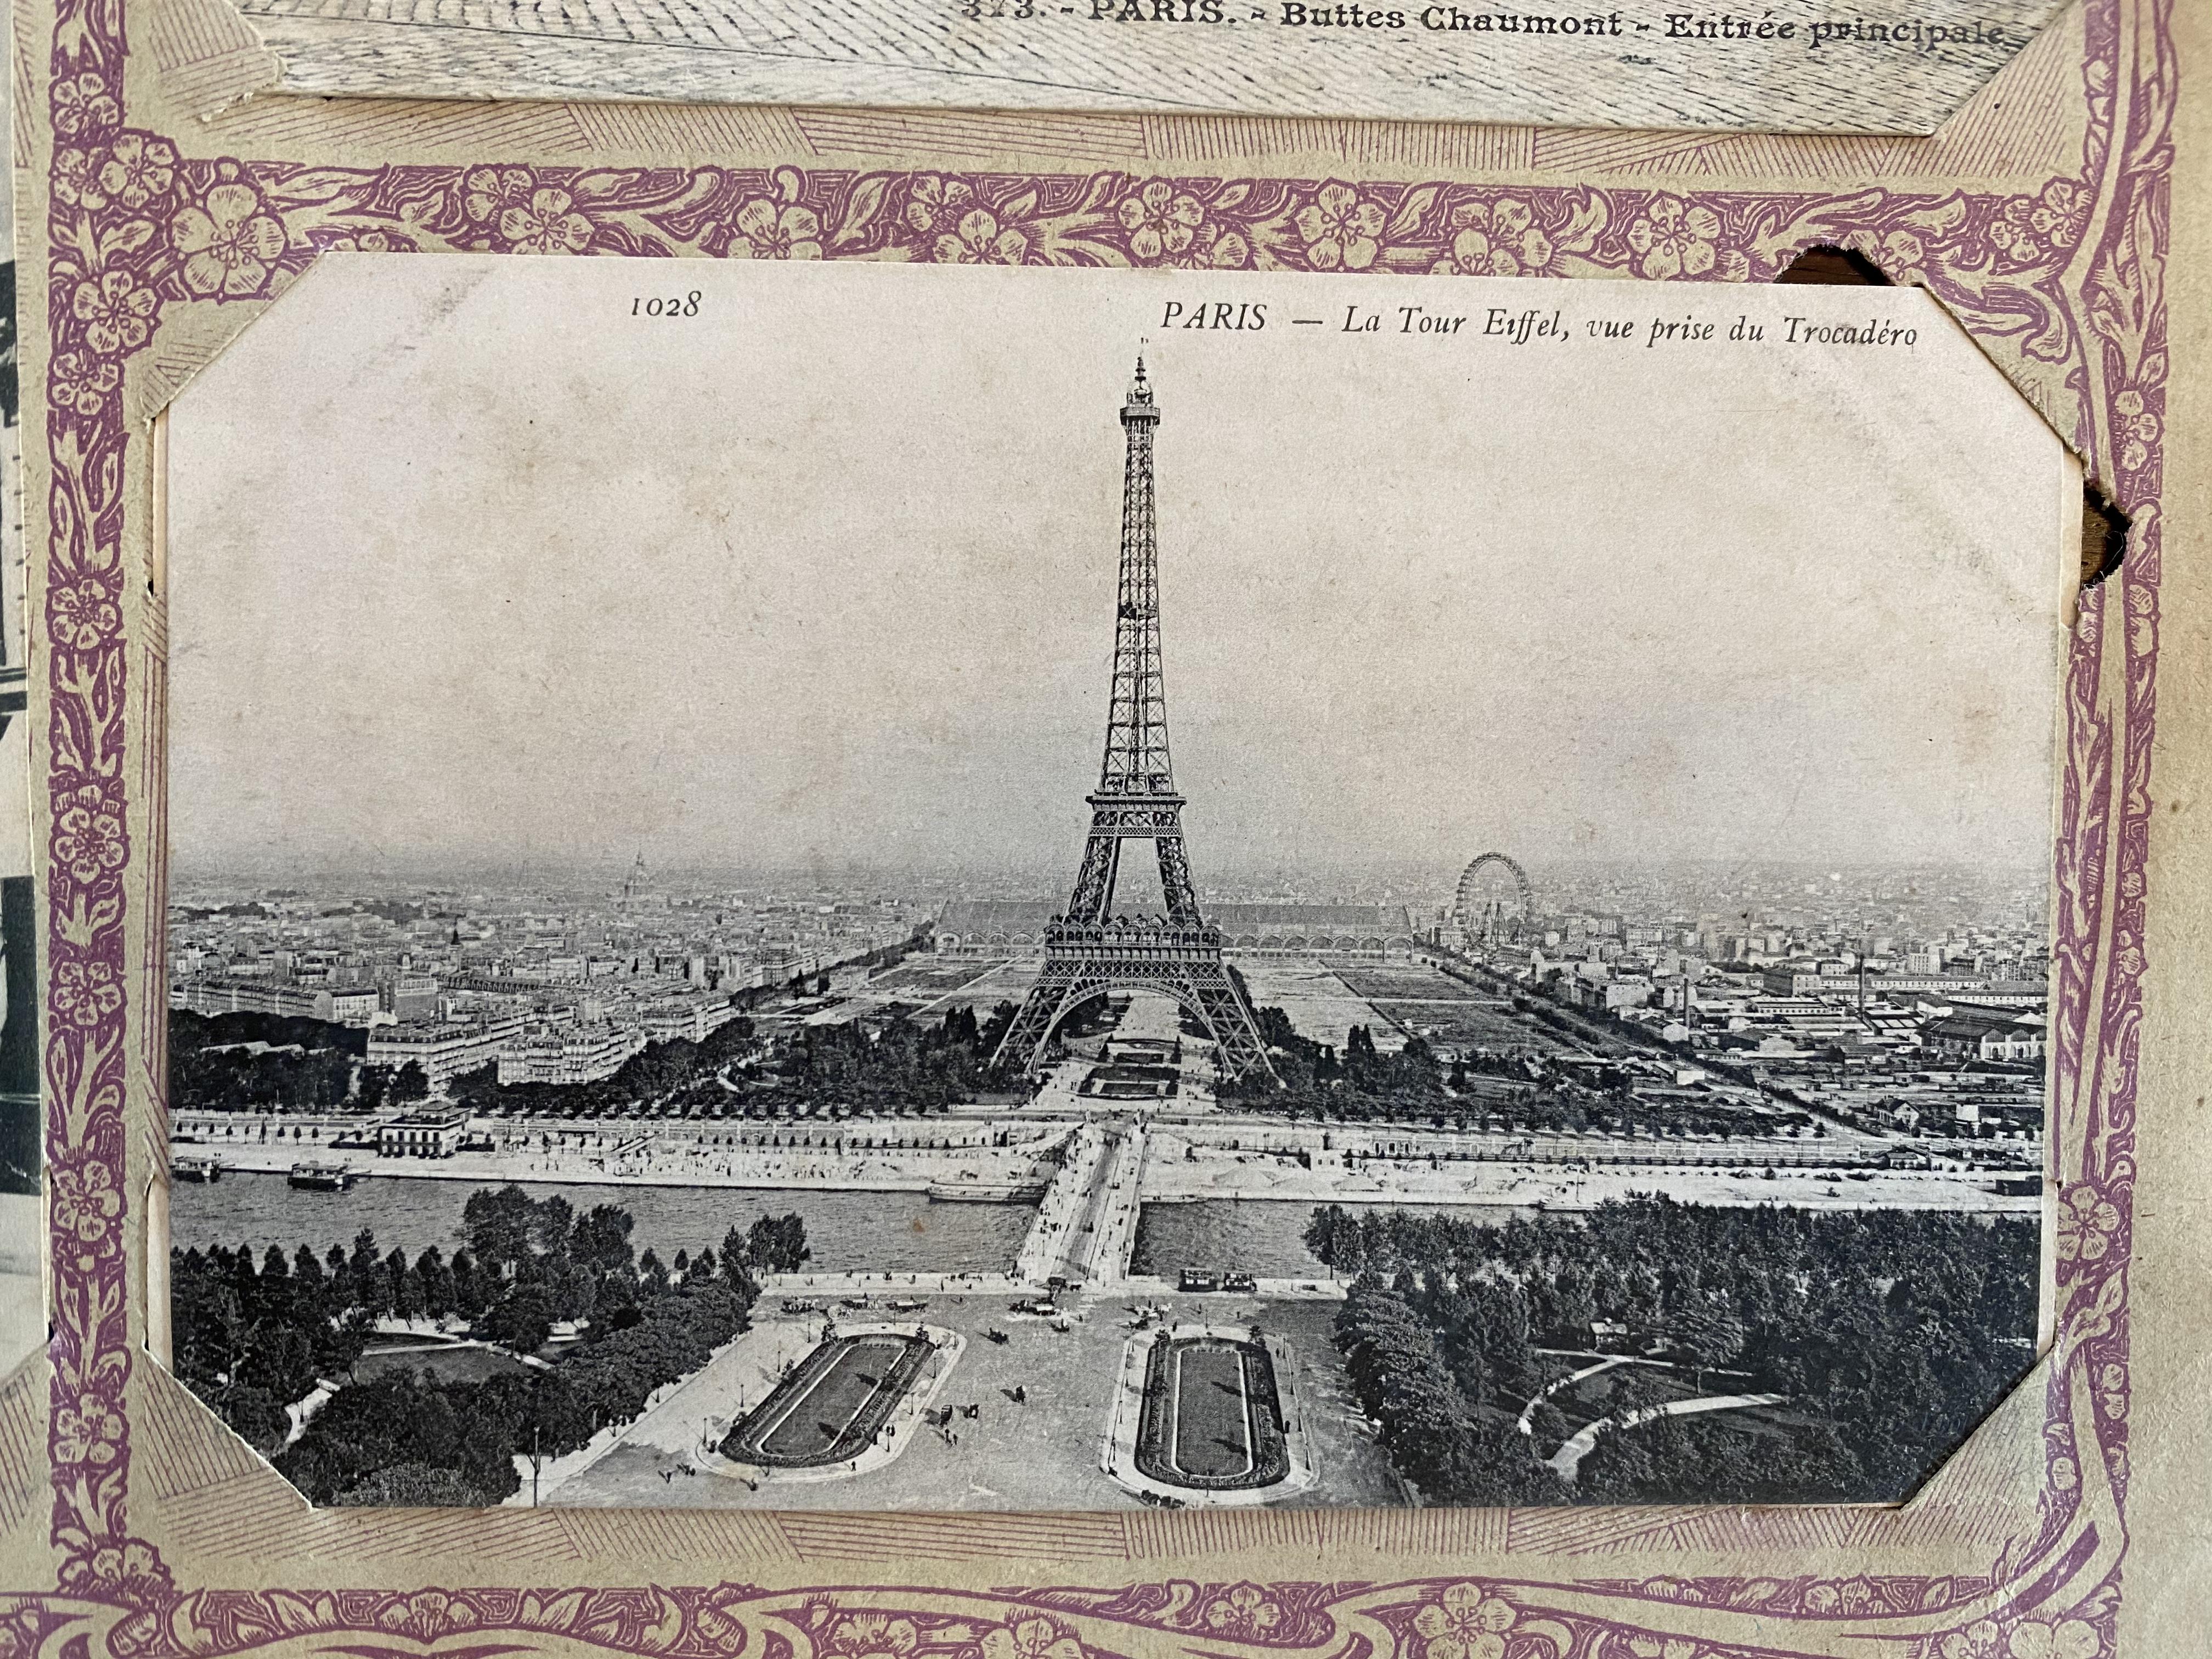 Cartes Postales de Paris